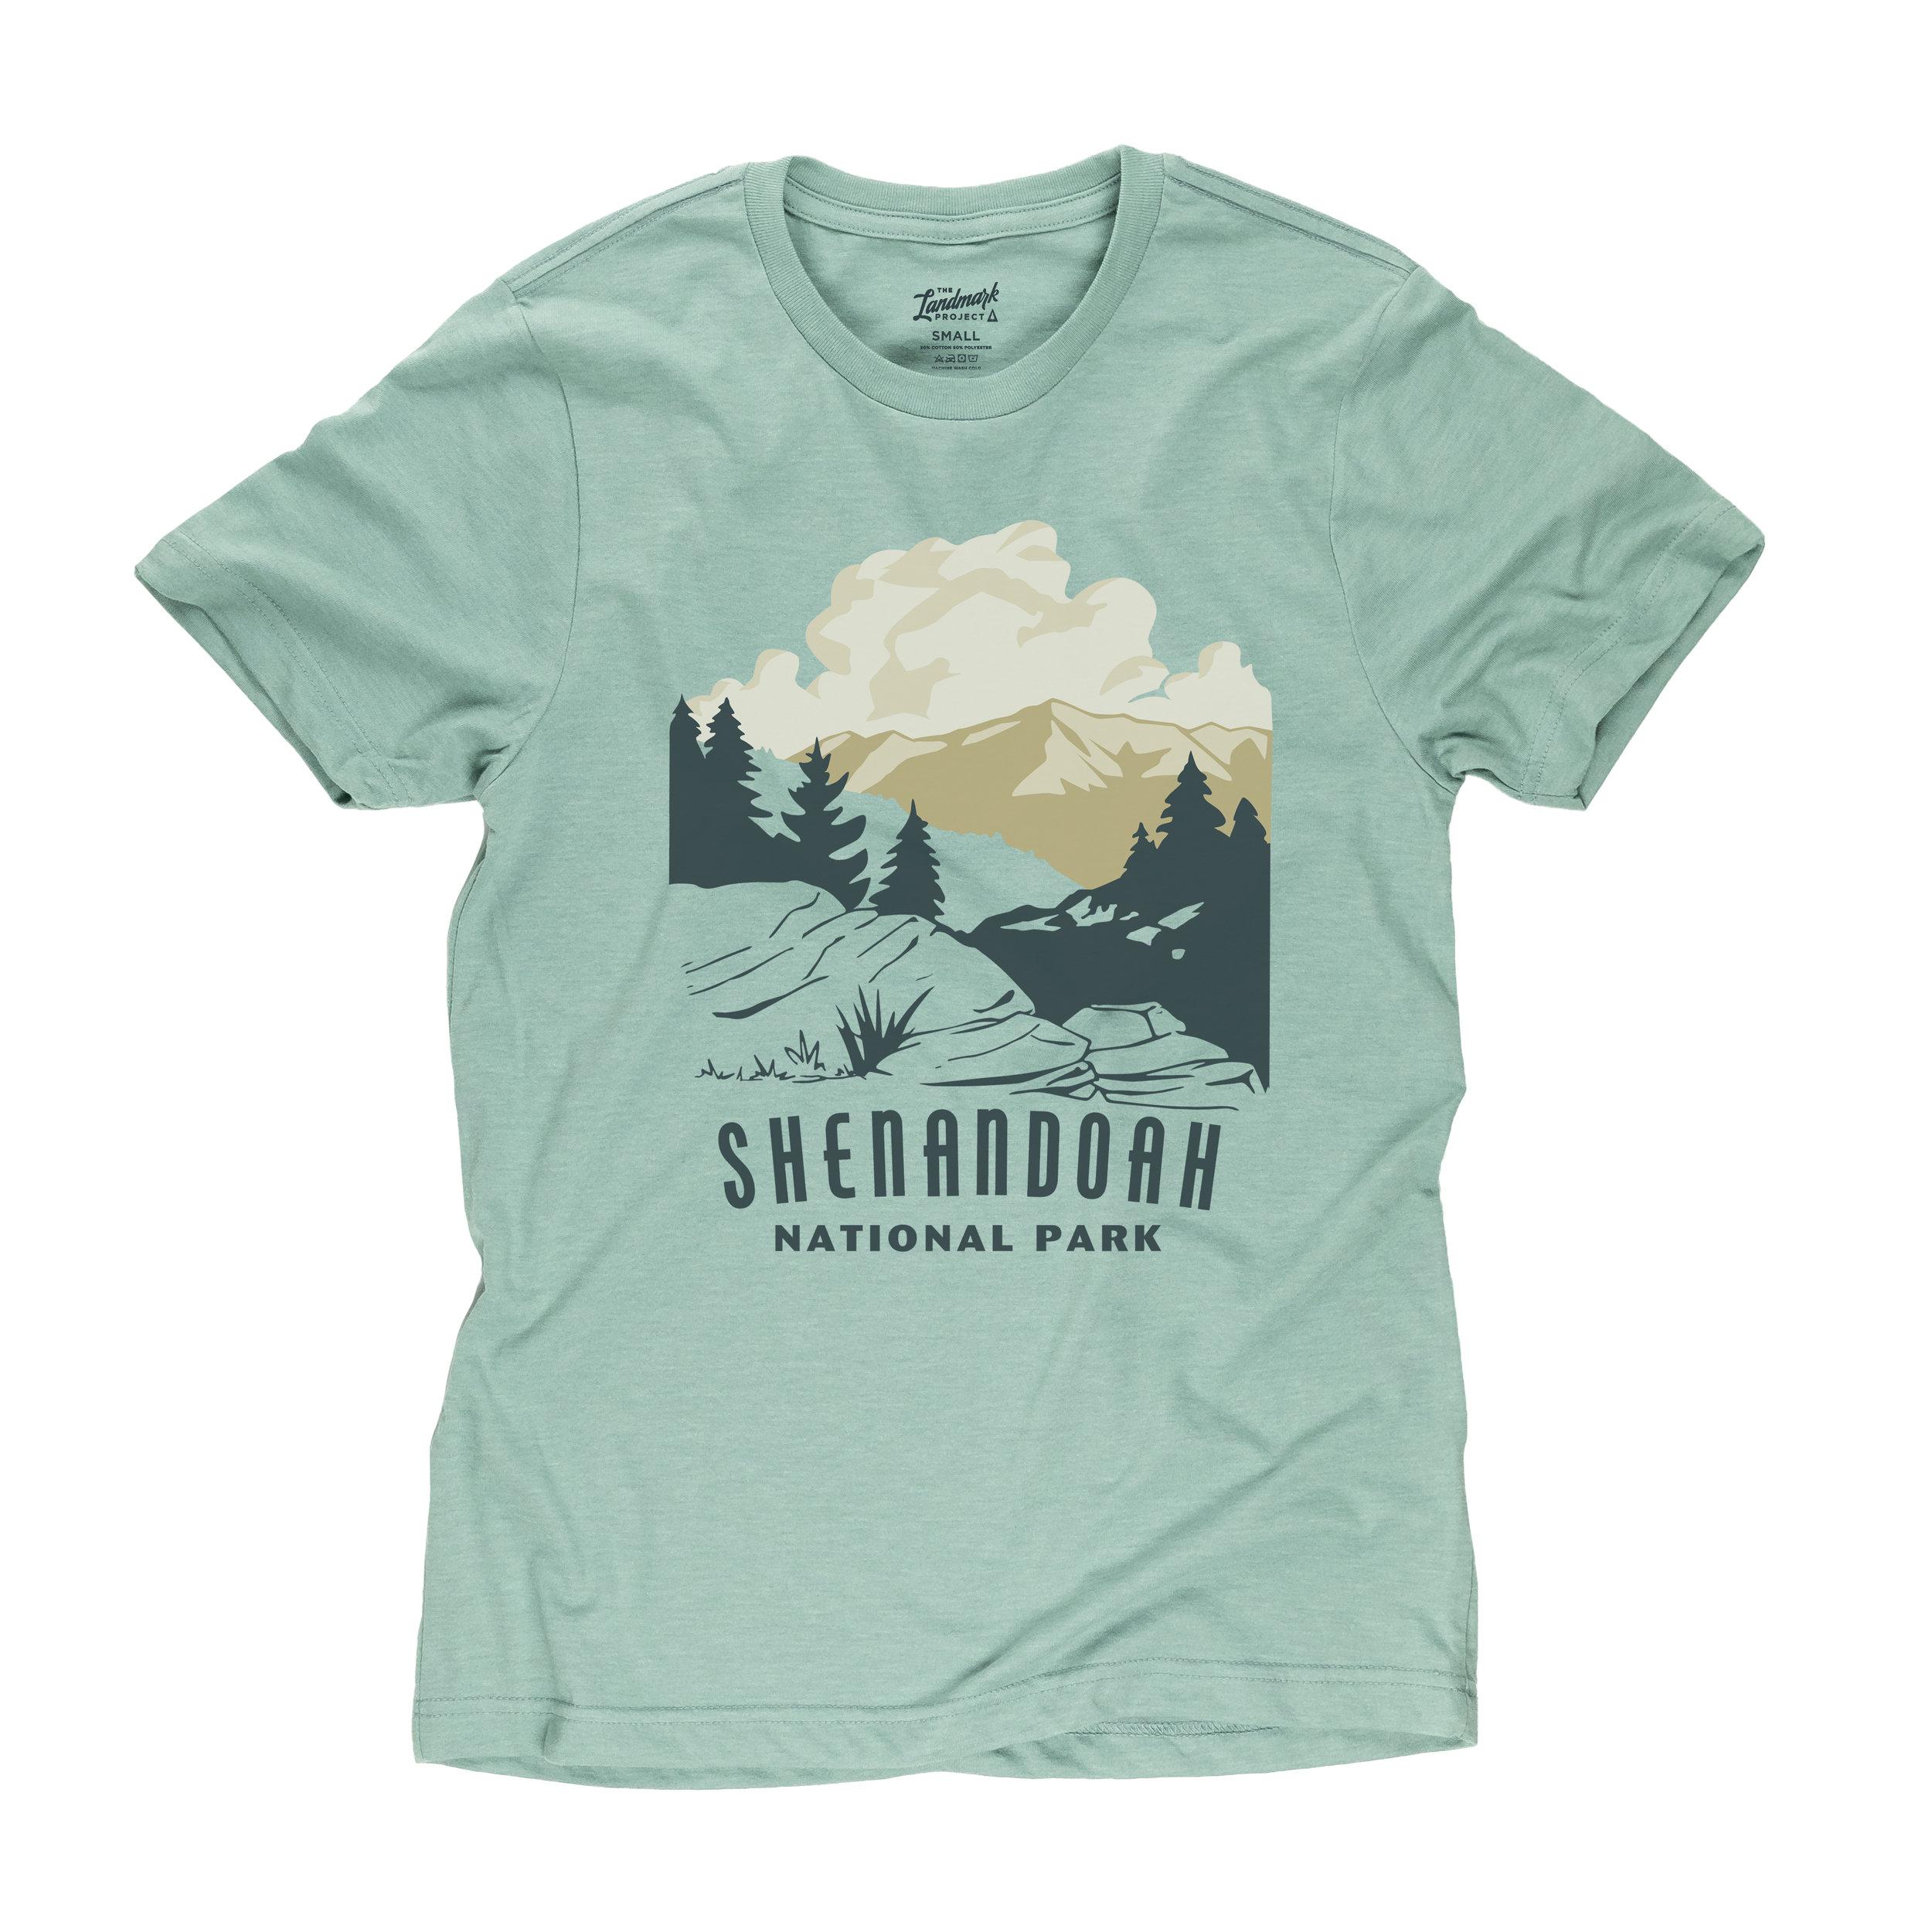 shenandoah-seafoam-tee.jpg